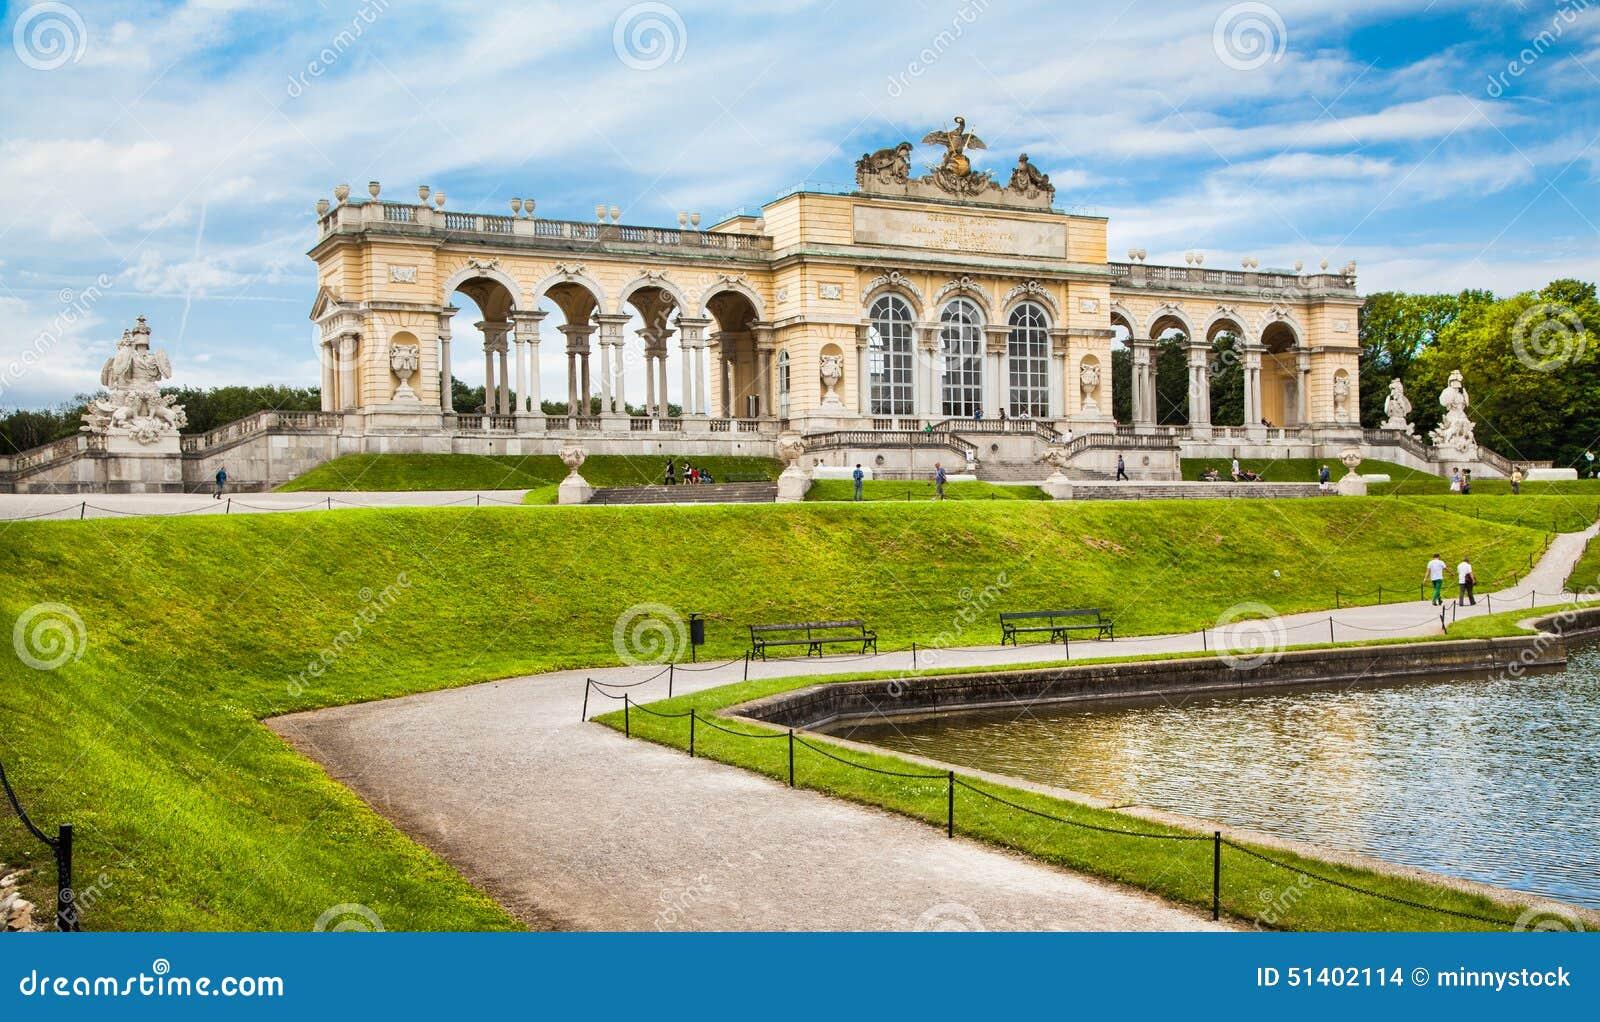 Gloriette no palácio de Schonbrunn e nos jardins, Viena, Áustria